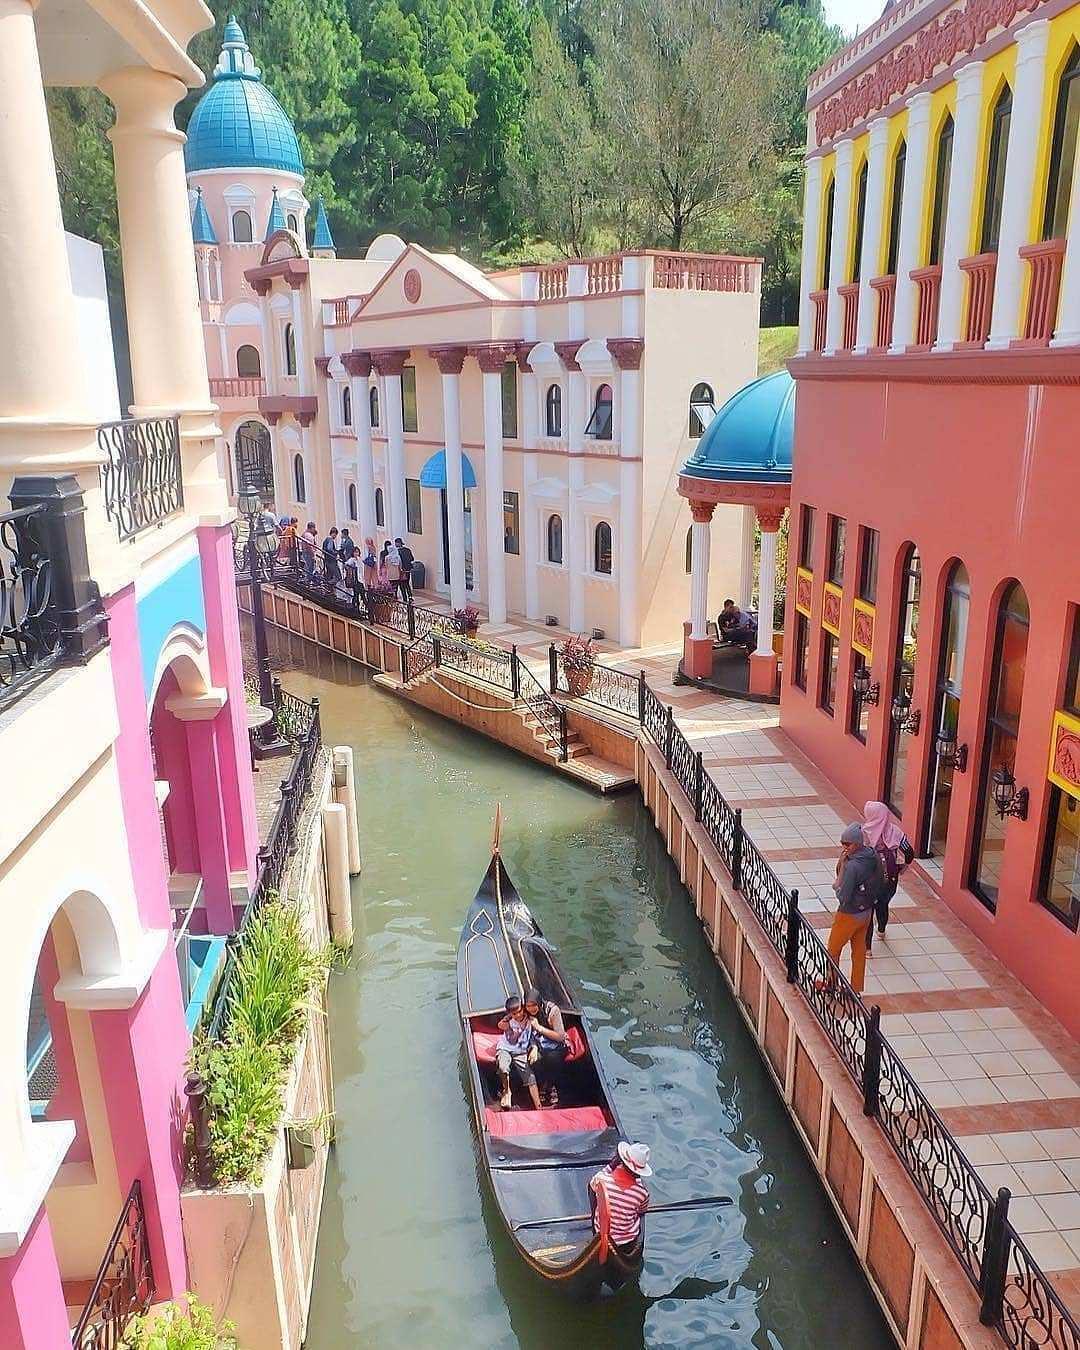 Foto suasana di Little Venice Kota Bunga Cianjur Image From @yustinautamii